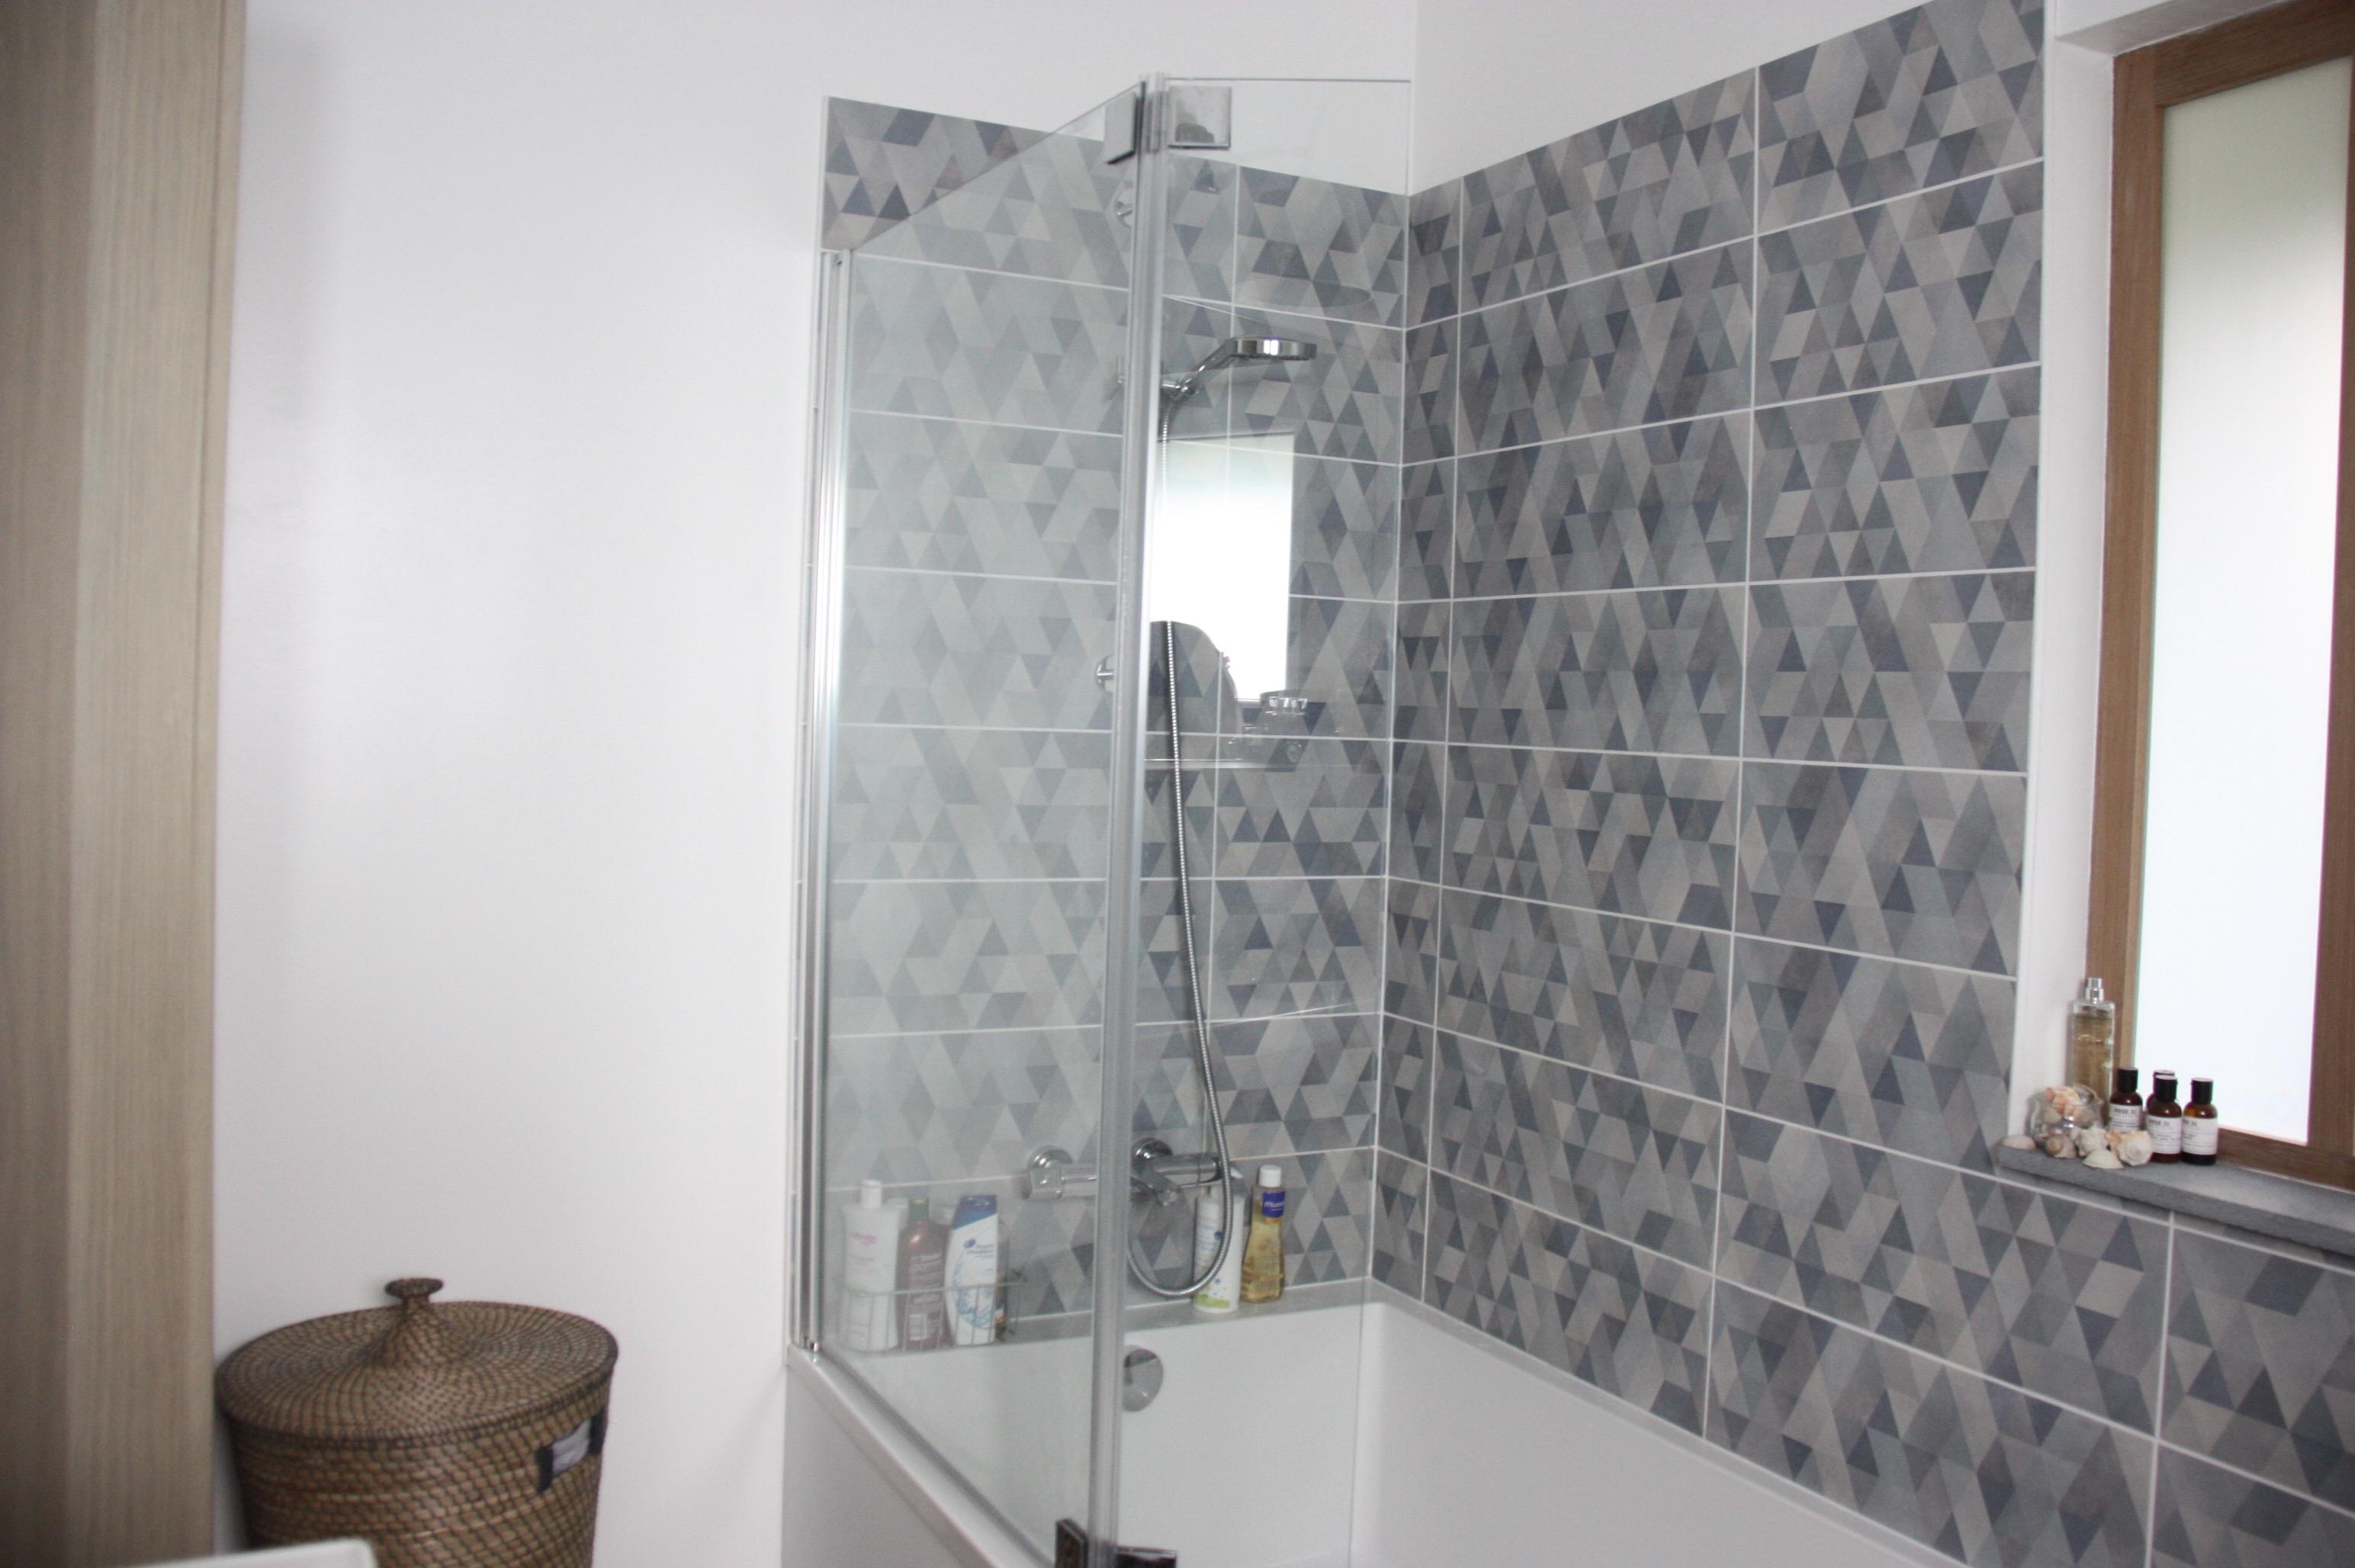 salle de bain scandinave meuble salle de bain scandinave. Black Bedroom Furniture Sets. Home Design Ideas